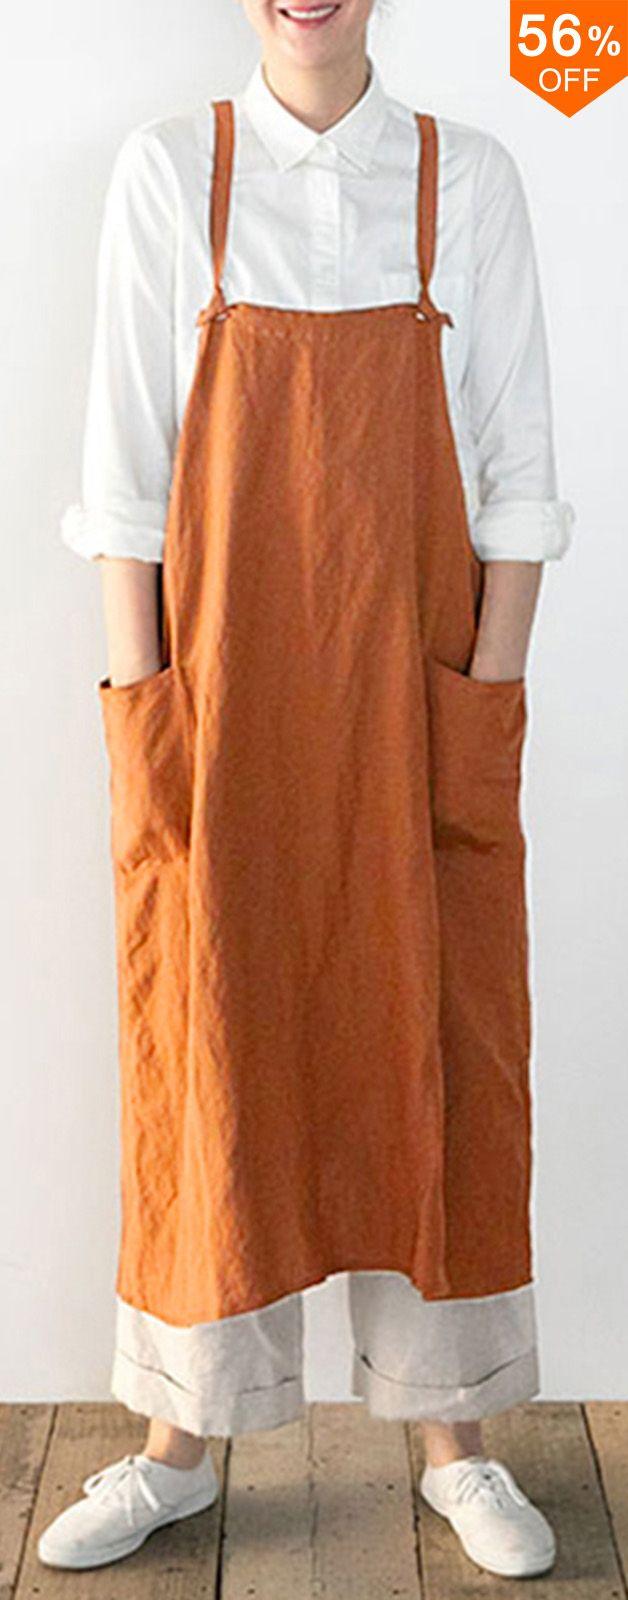 44ae4be2273eb 56%OFF Free shipping. Japanese Dress Sleeveless Strap Linen Apron ...